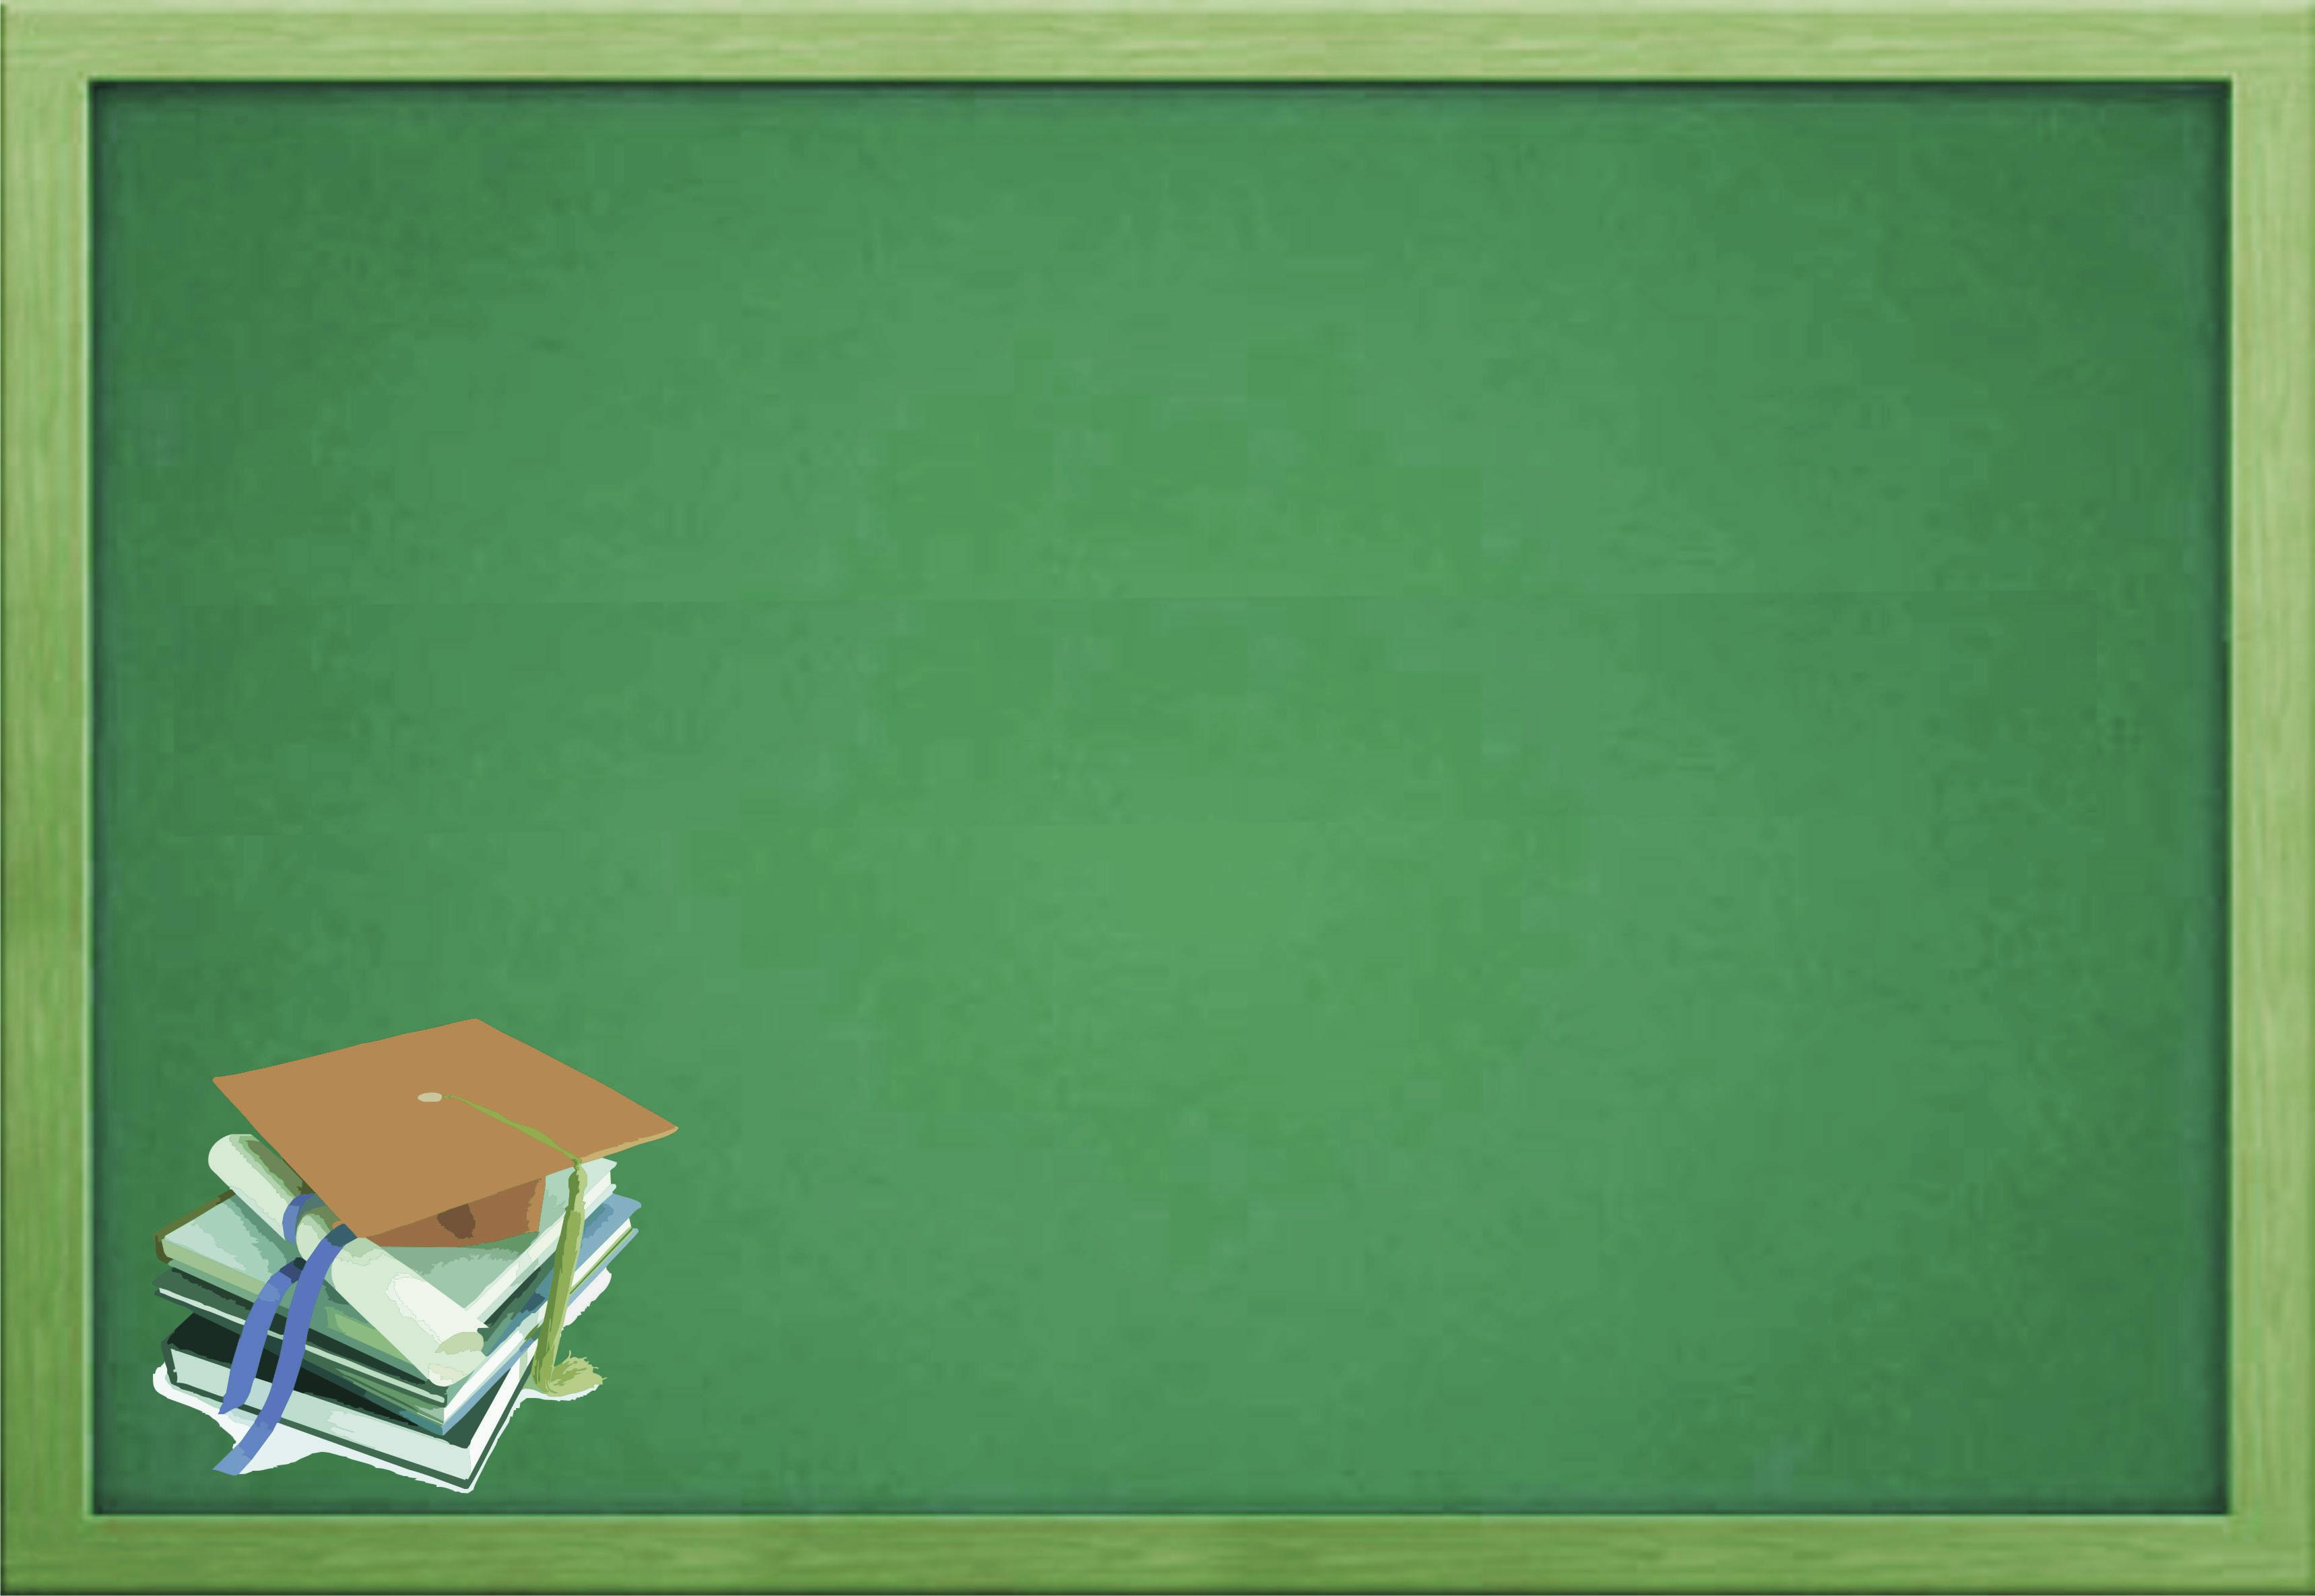 Educational Wallpapers Wallpaper Cave